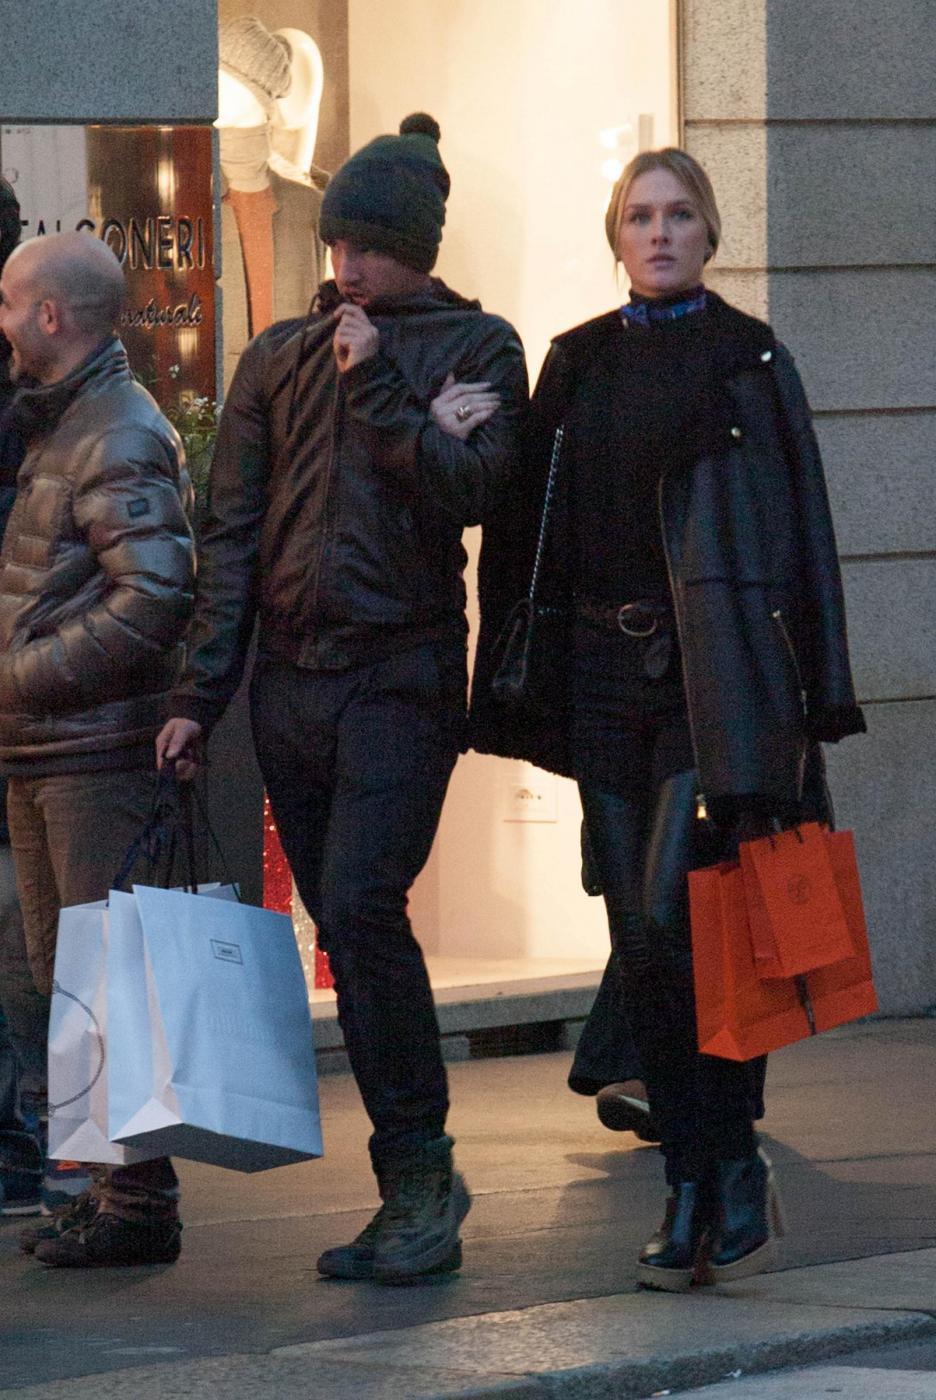 Pato, shopping a Milano con fidanzata Fiorella Mattheis6